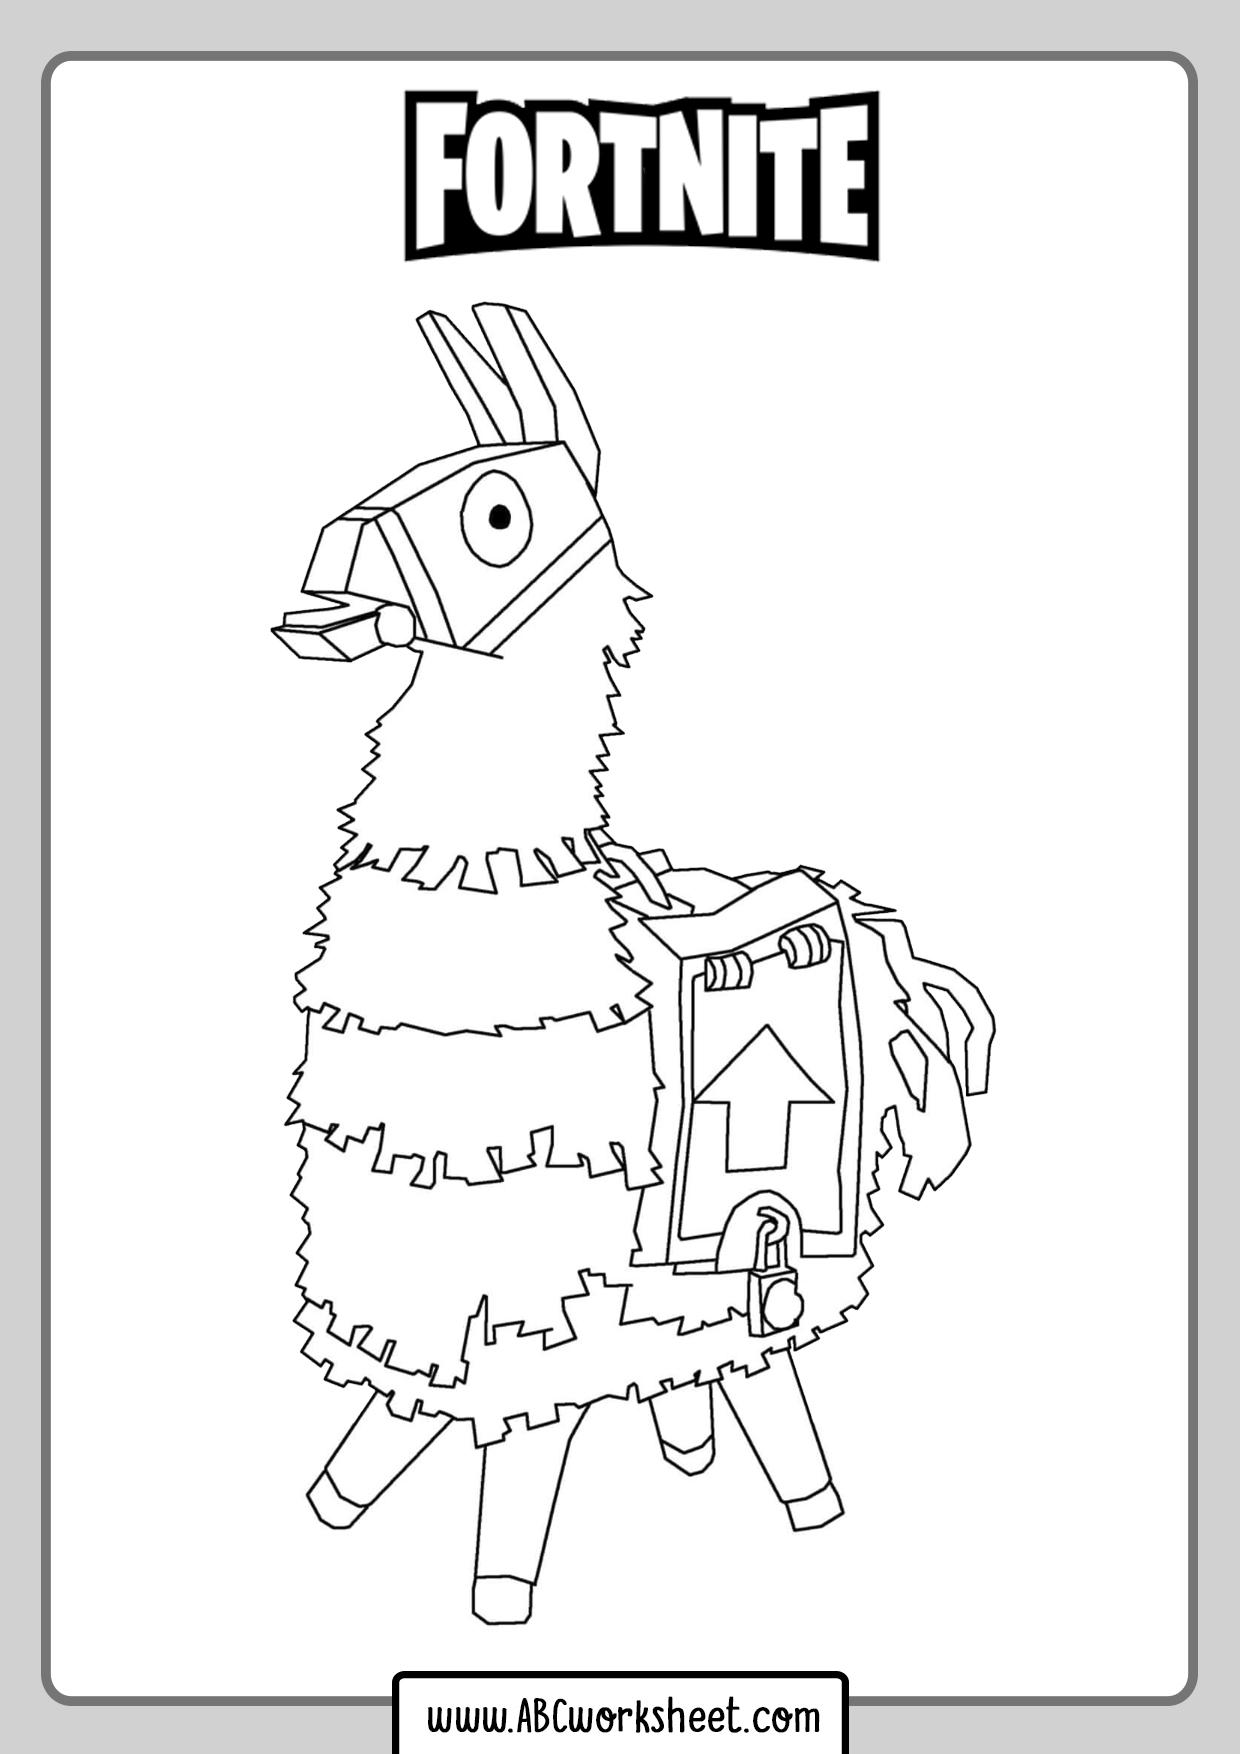 Llama Fortnite Coloring Page